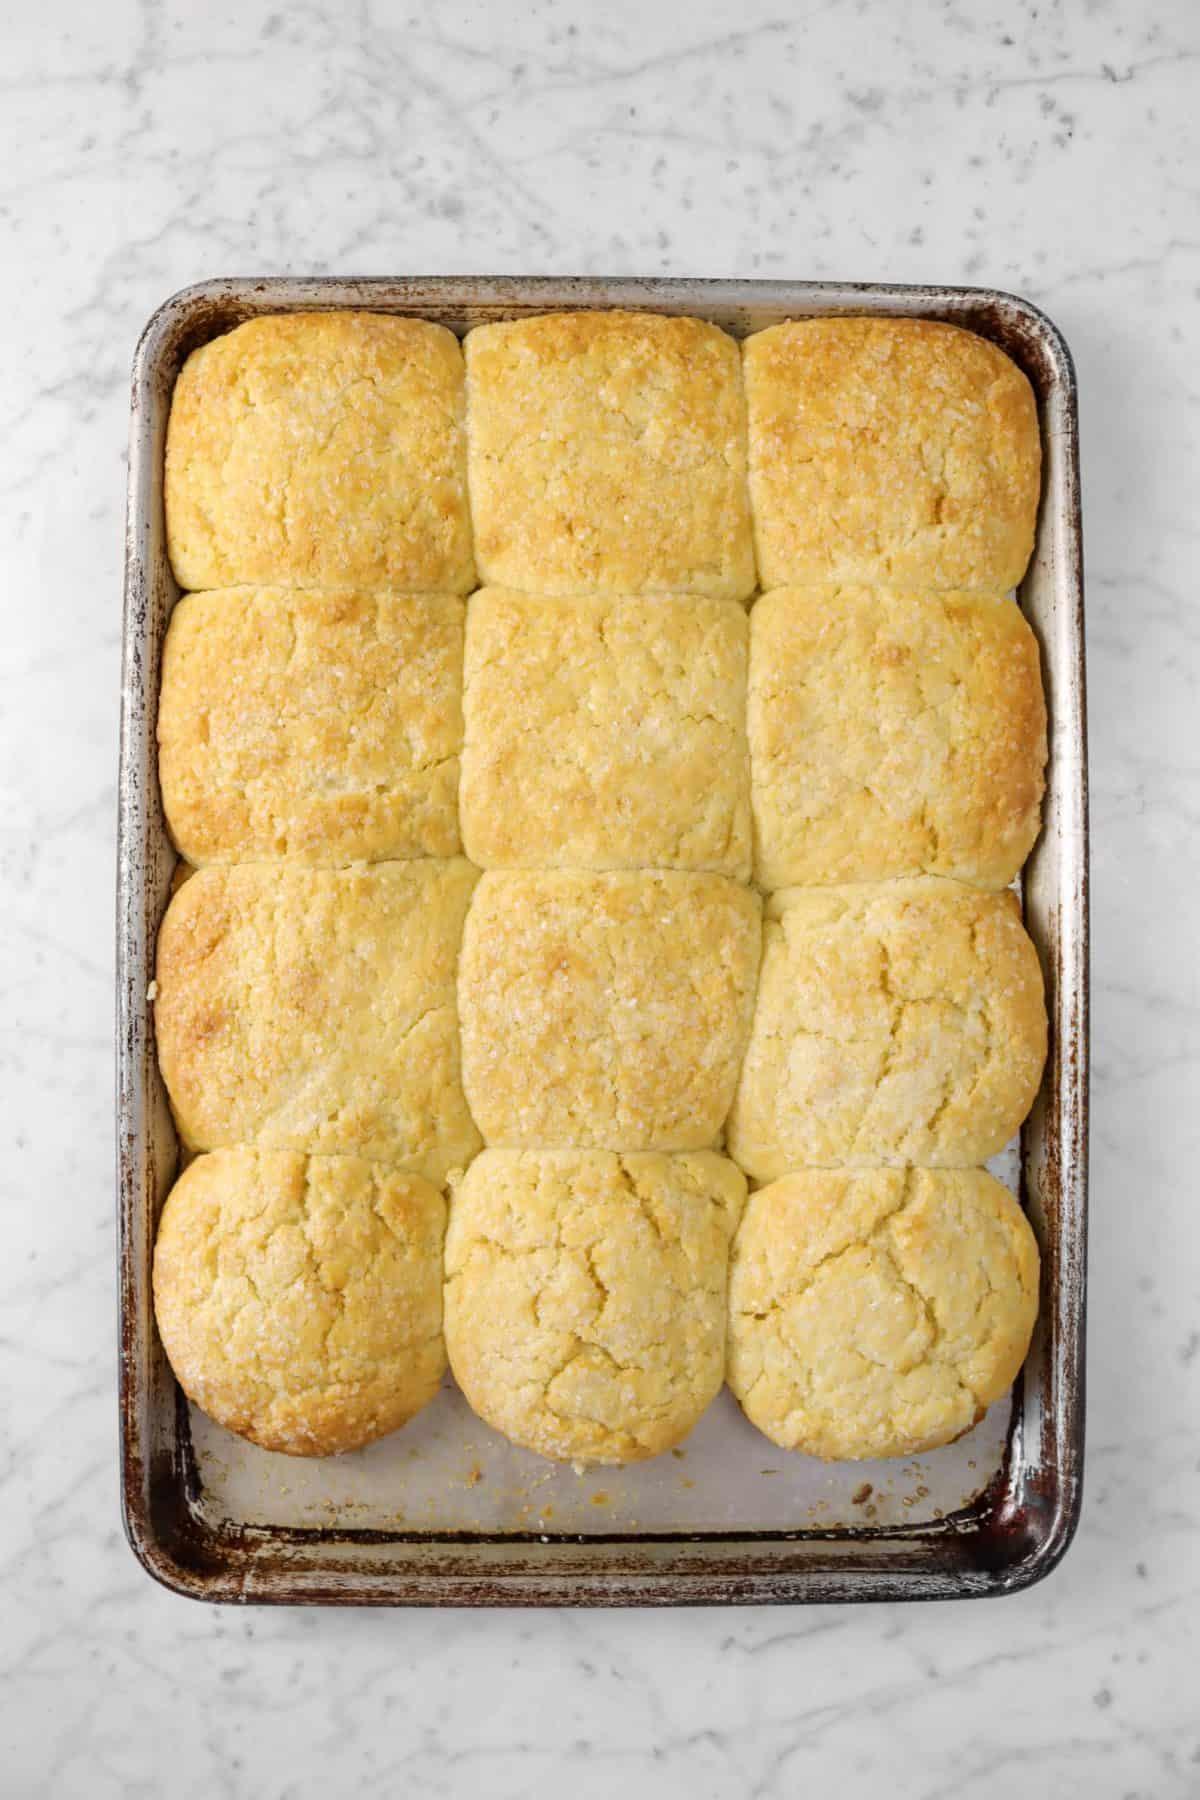 shortcakes baked on a baking sheet